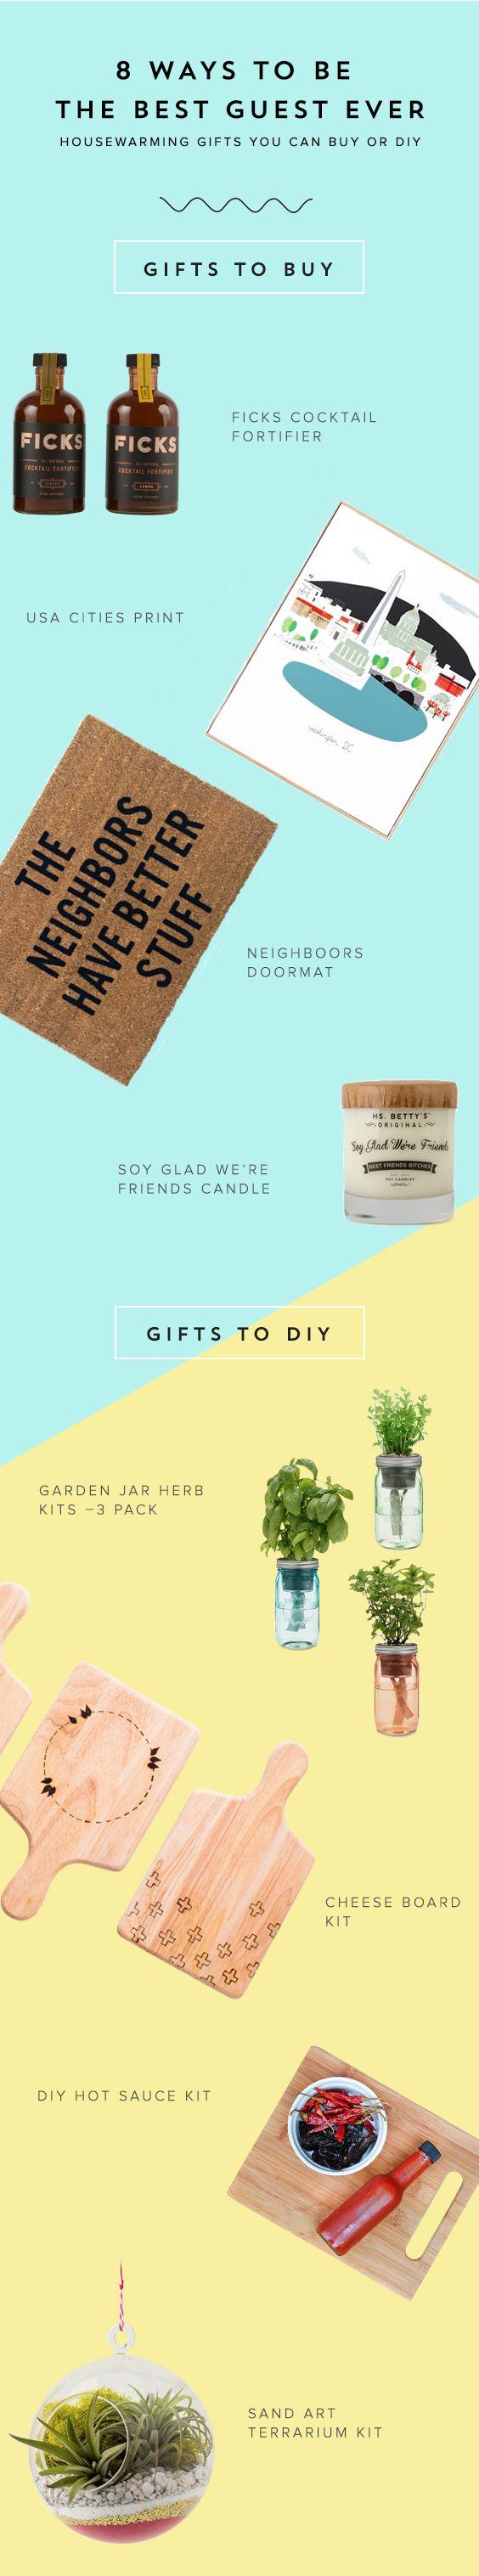 17 Best Ideas About Best Housewarming Gifts On Pinterest